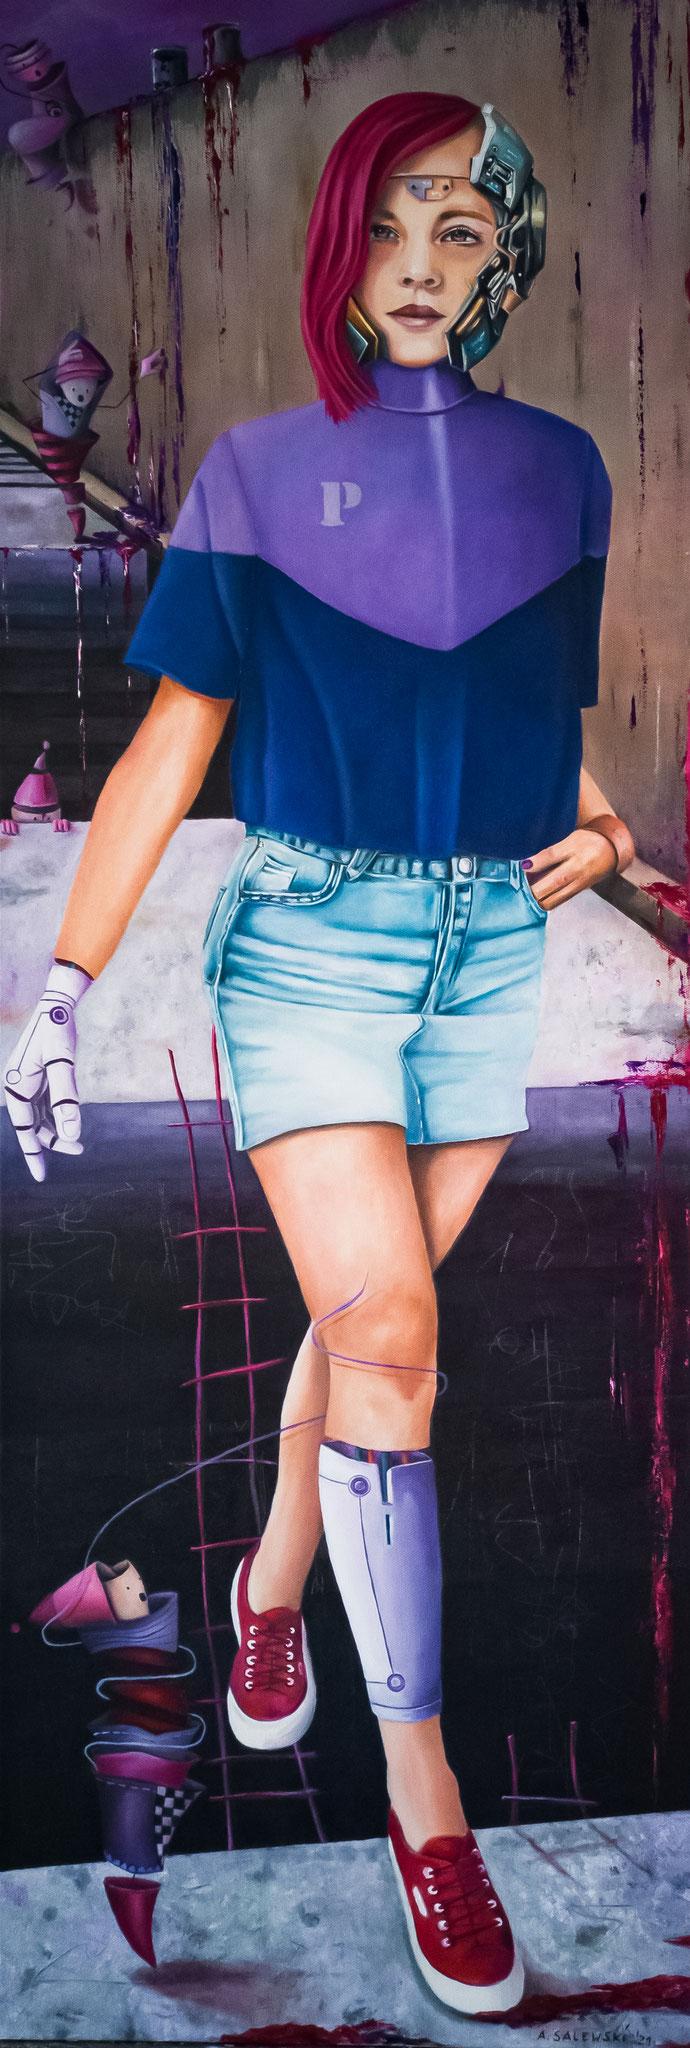 """Purple City"" | 2021 | Öl und Acryl auf Leinwand | 40x120 cm"